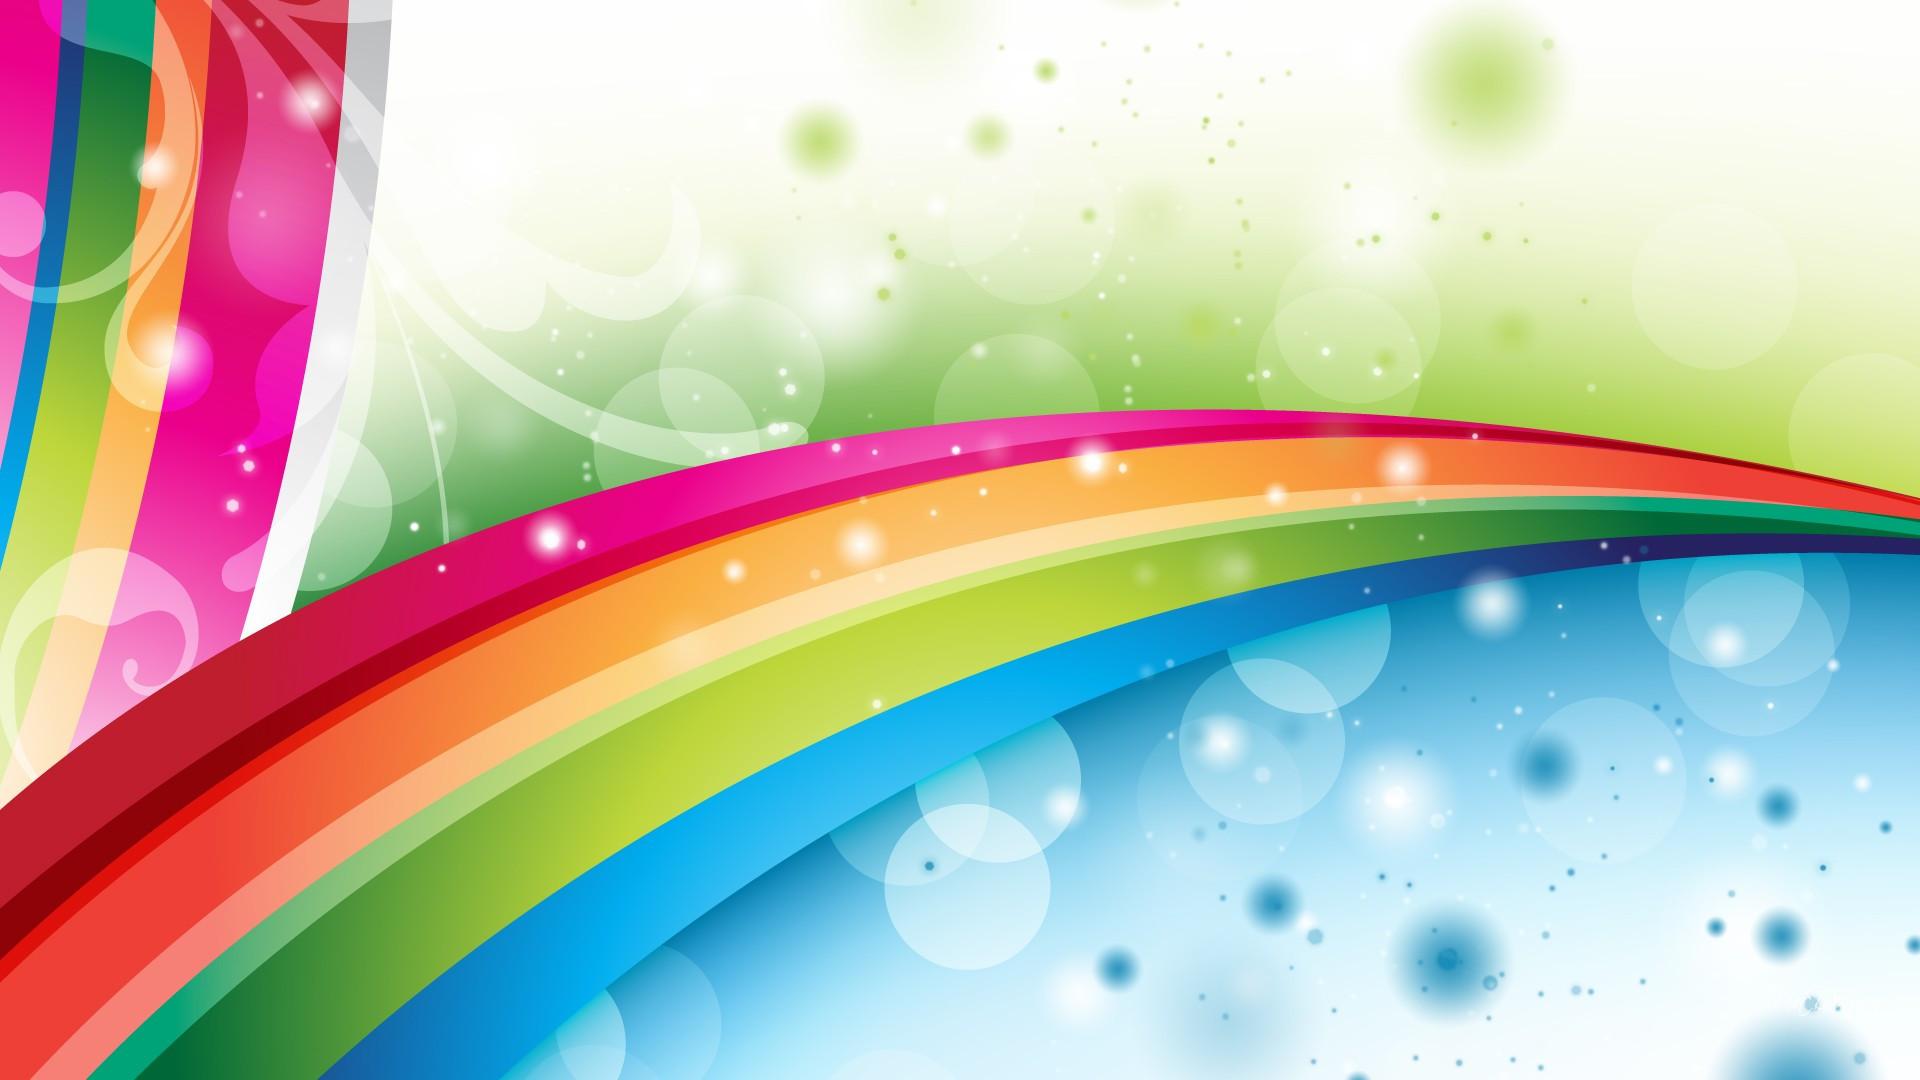 Cute Piano Wallpaper Rainbow Zebra Background Designs 183 ①